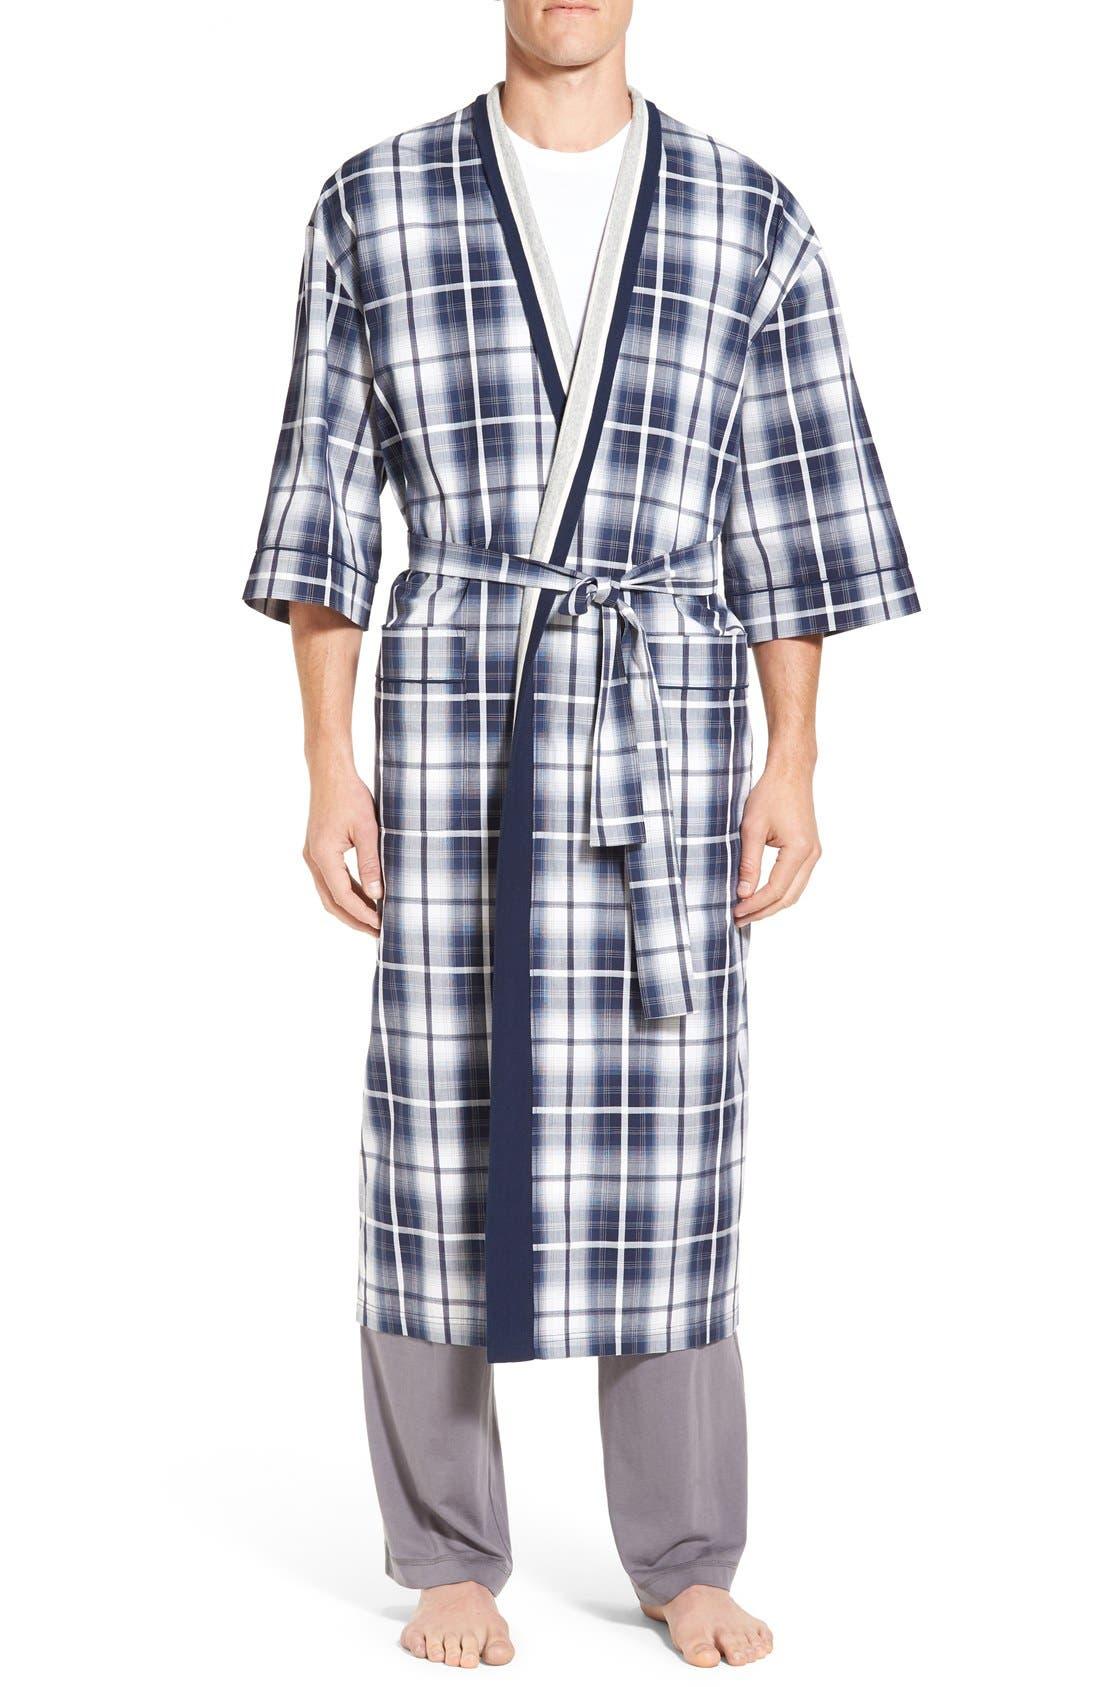 Main Image - Majestic International 'Mad 4 Plaid' Robe